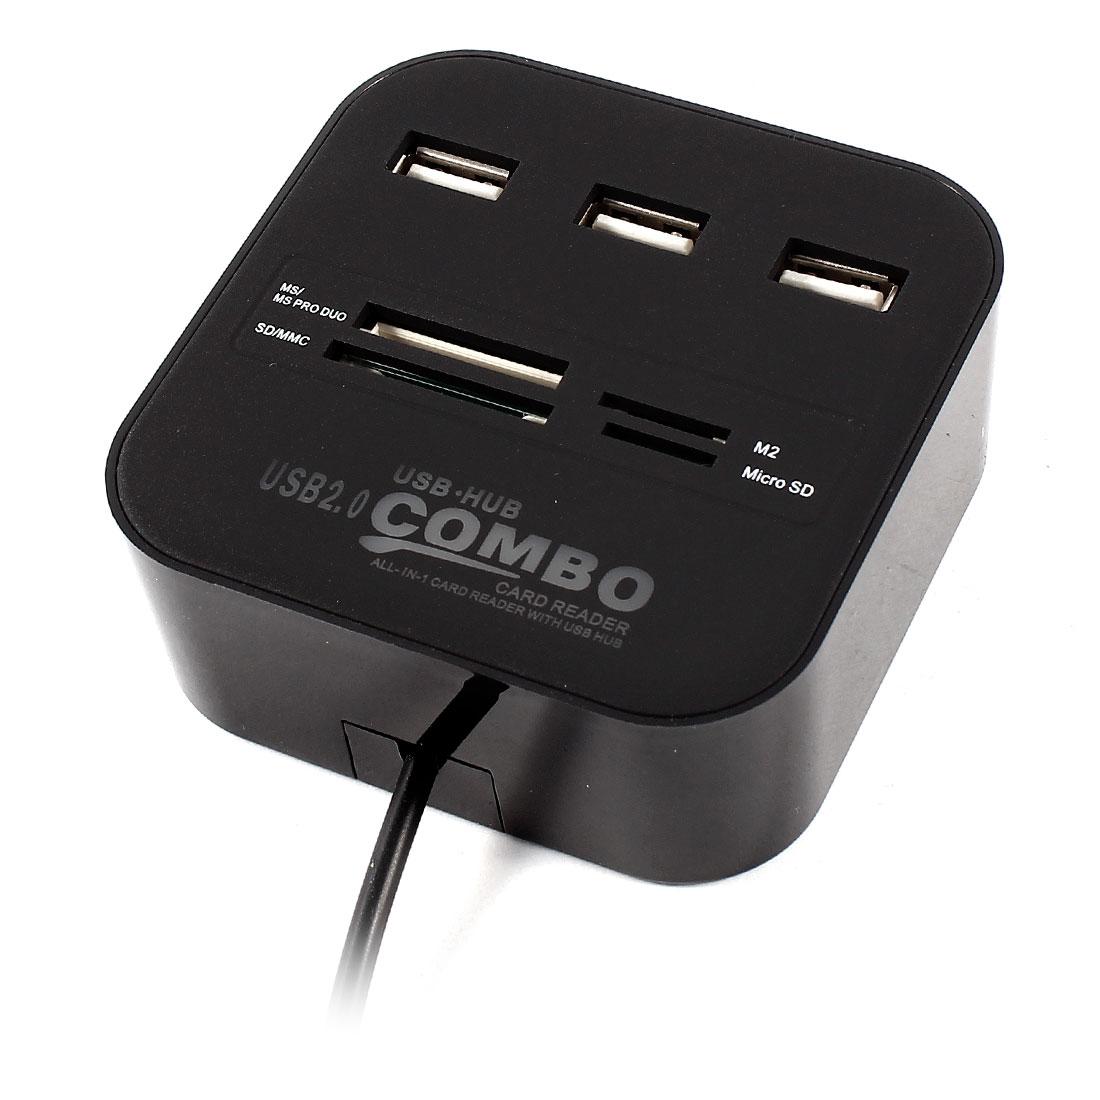 Blue LED Hi-Speed 3Ports USB 2.0 HUB Adapter TF SD Multi Card Reader Combo Black